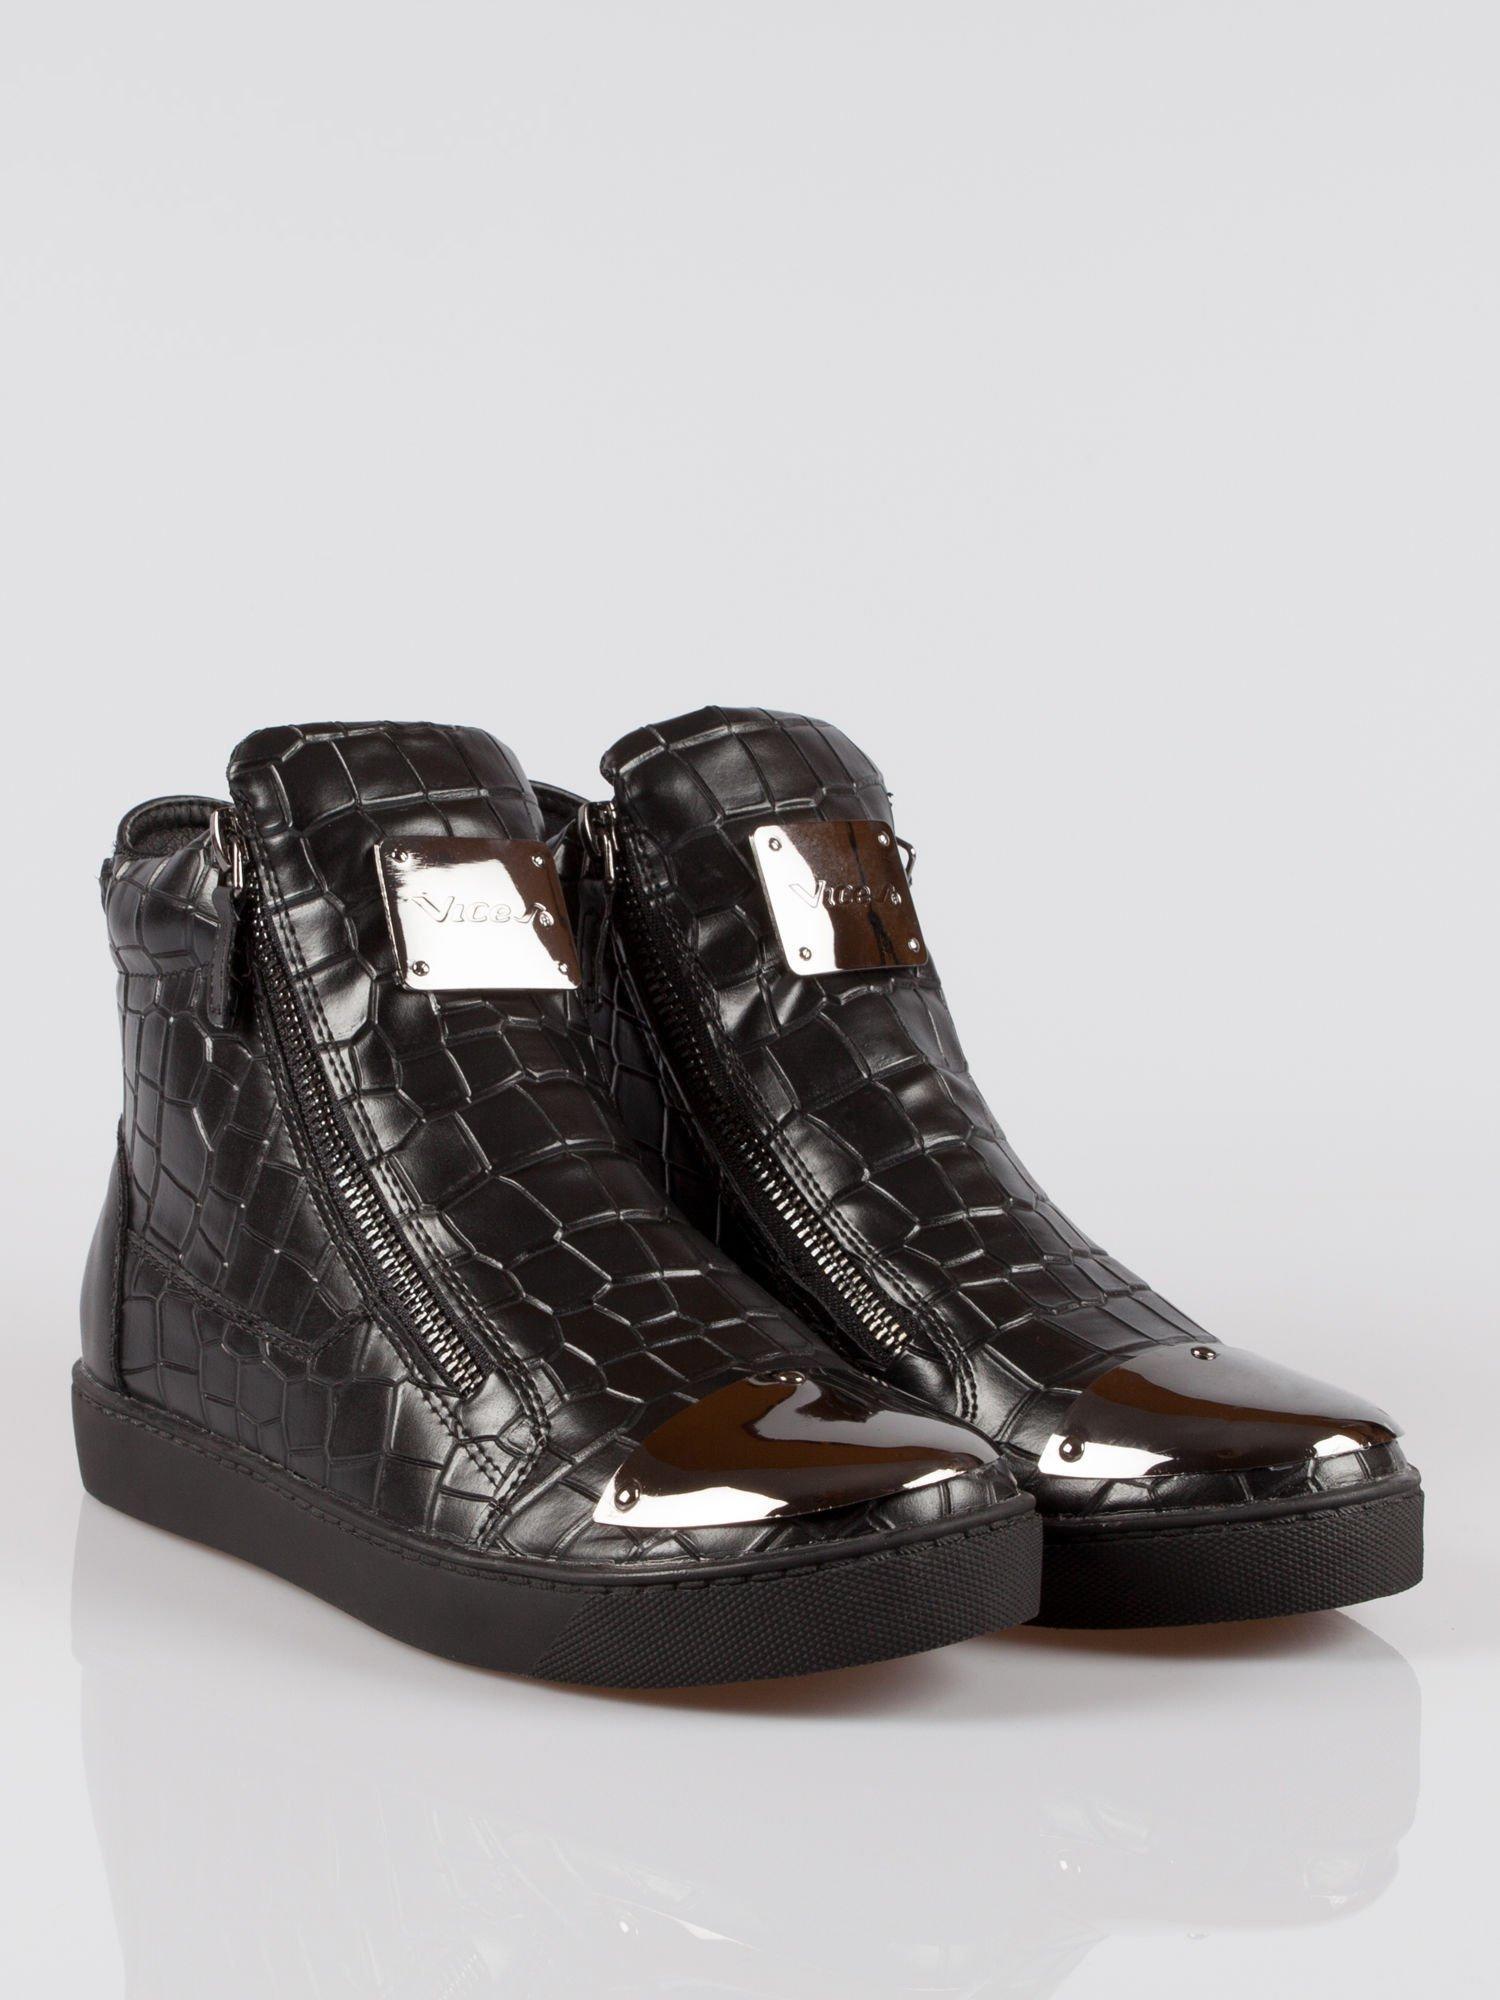 Czarne sneakersy Vanessa tłoczone na wzór skóry krokodyla                                  zdj.                                  2